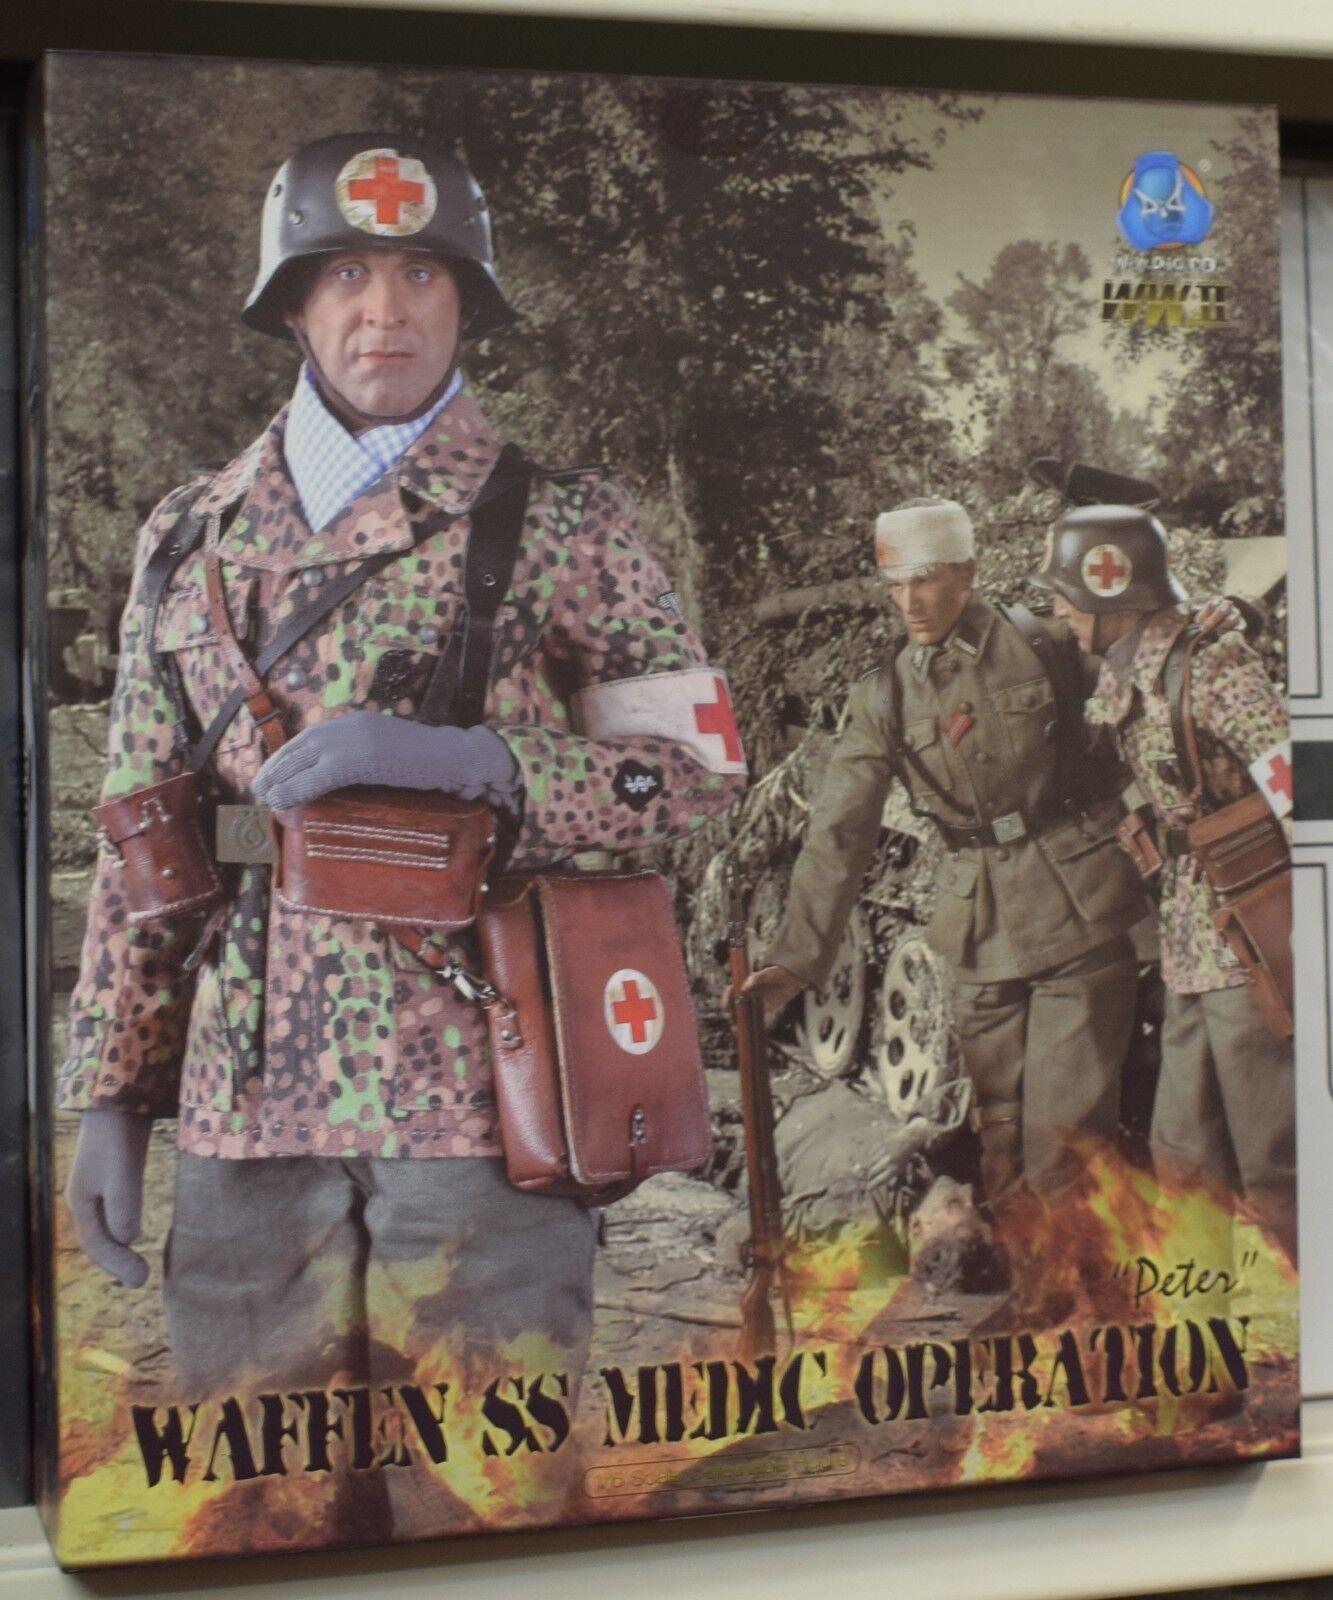 DRAGON IN DREAMS DID 3-R 1 6th SCALE WW II GERMAN MEDIC PETER